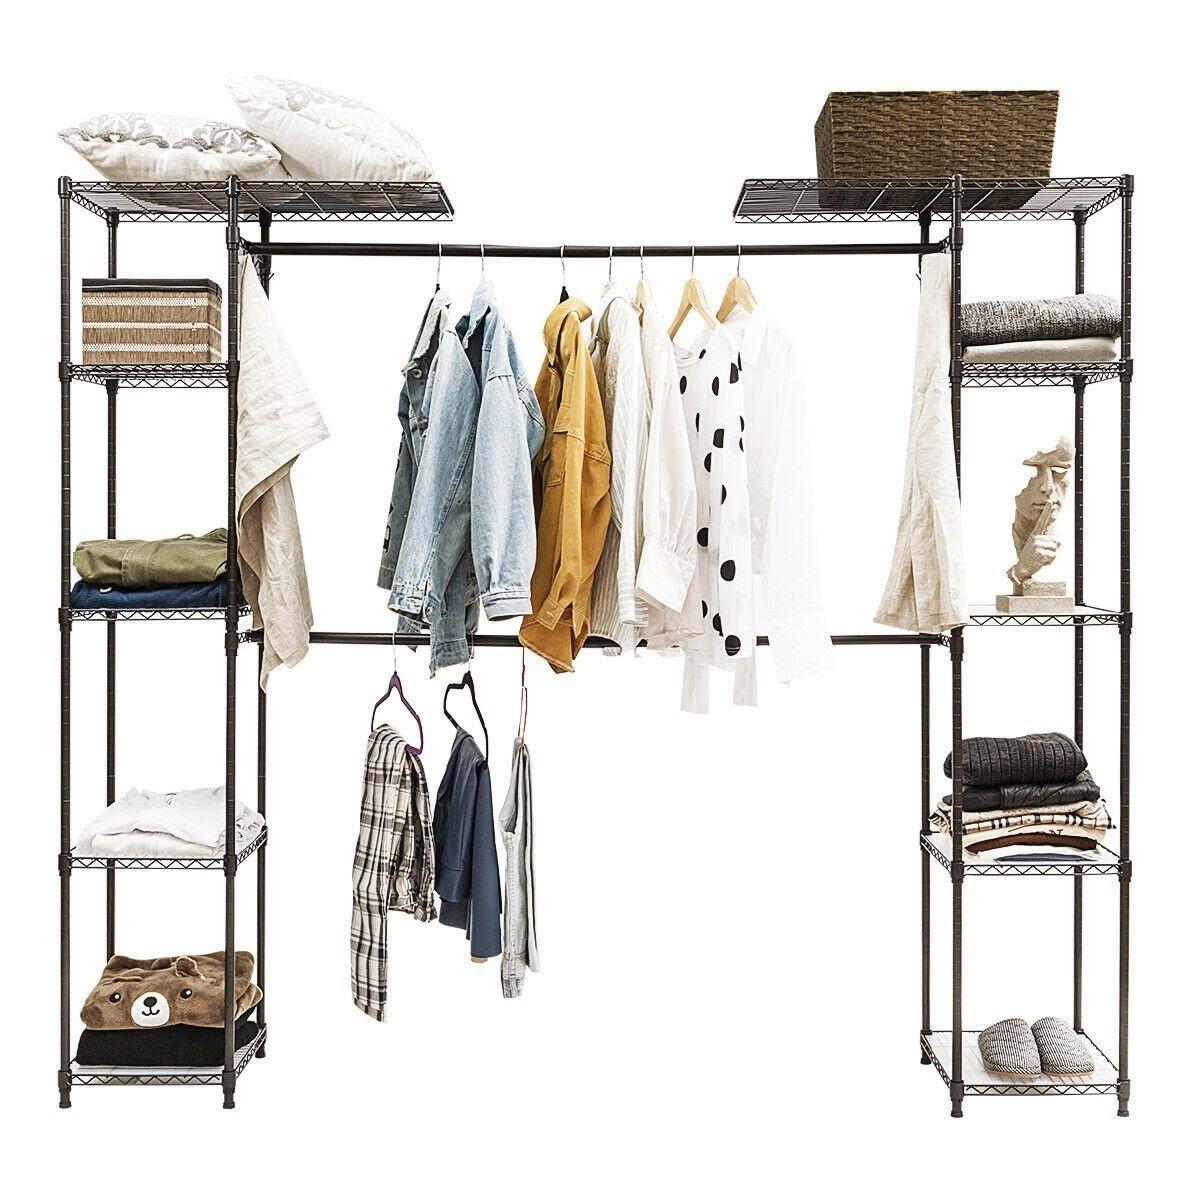 Expandable Free Standing Closet Clothes Hanger Rack Clothes